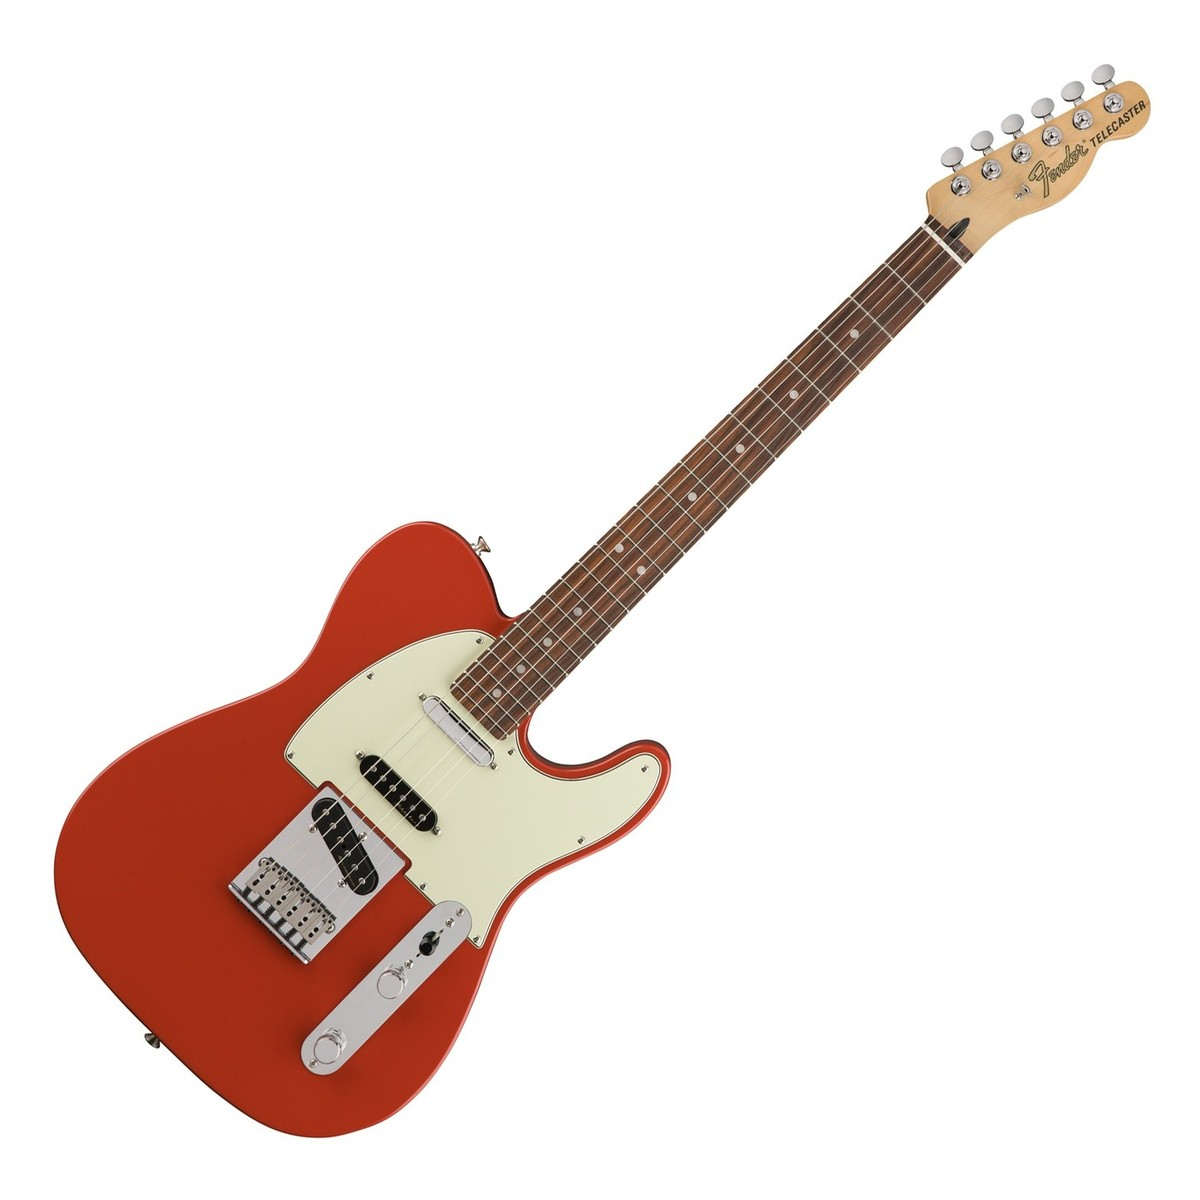 fender deluxe nashville telecaster electric guitar pf fiesta red at. Black Bedroom Furniture Sets. Home Design Ideas